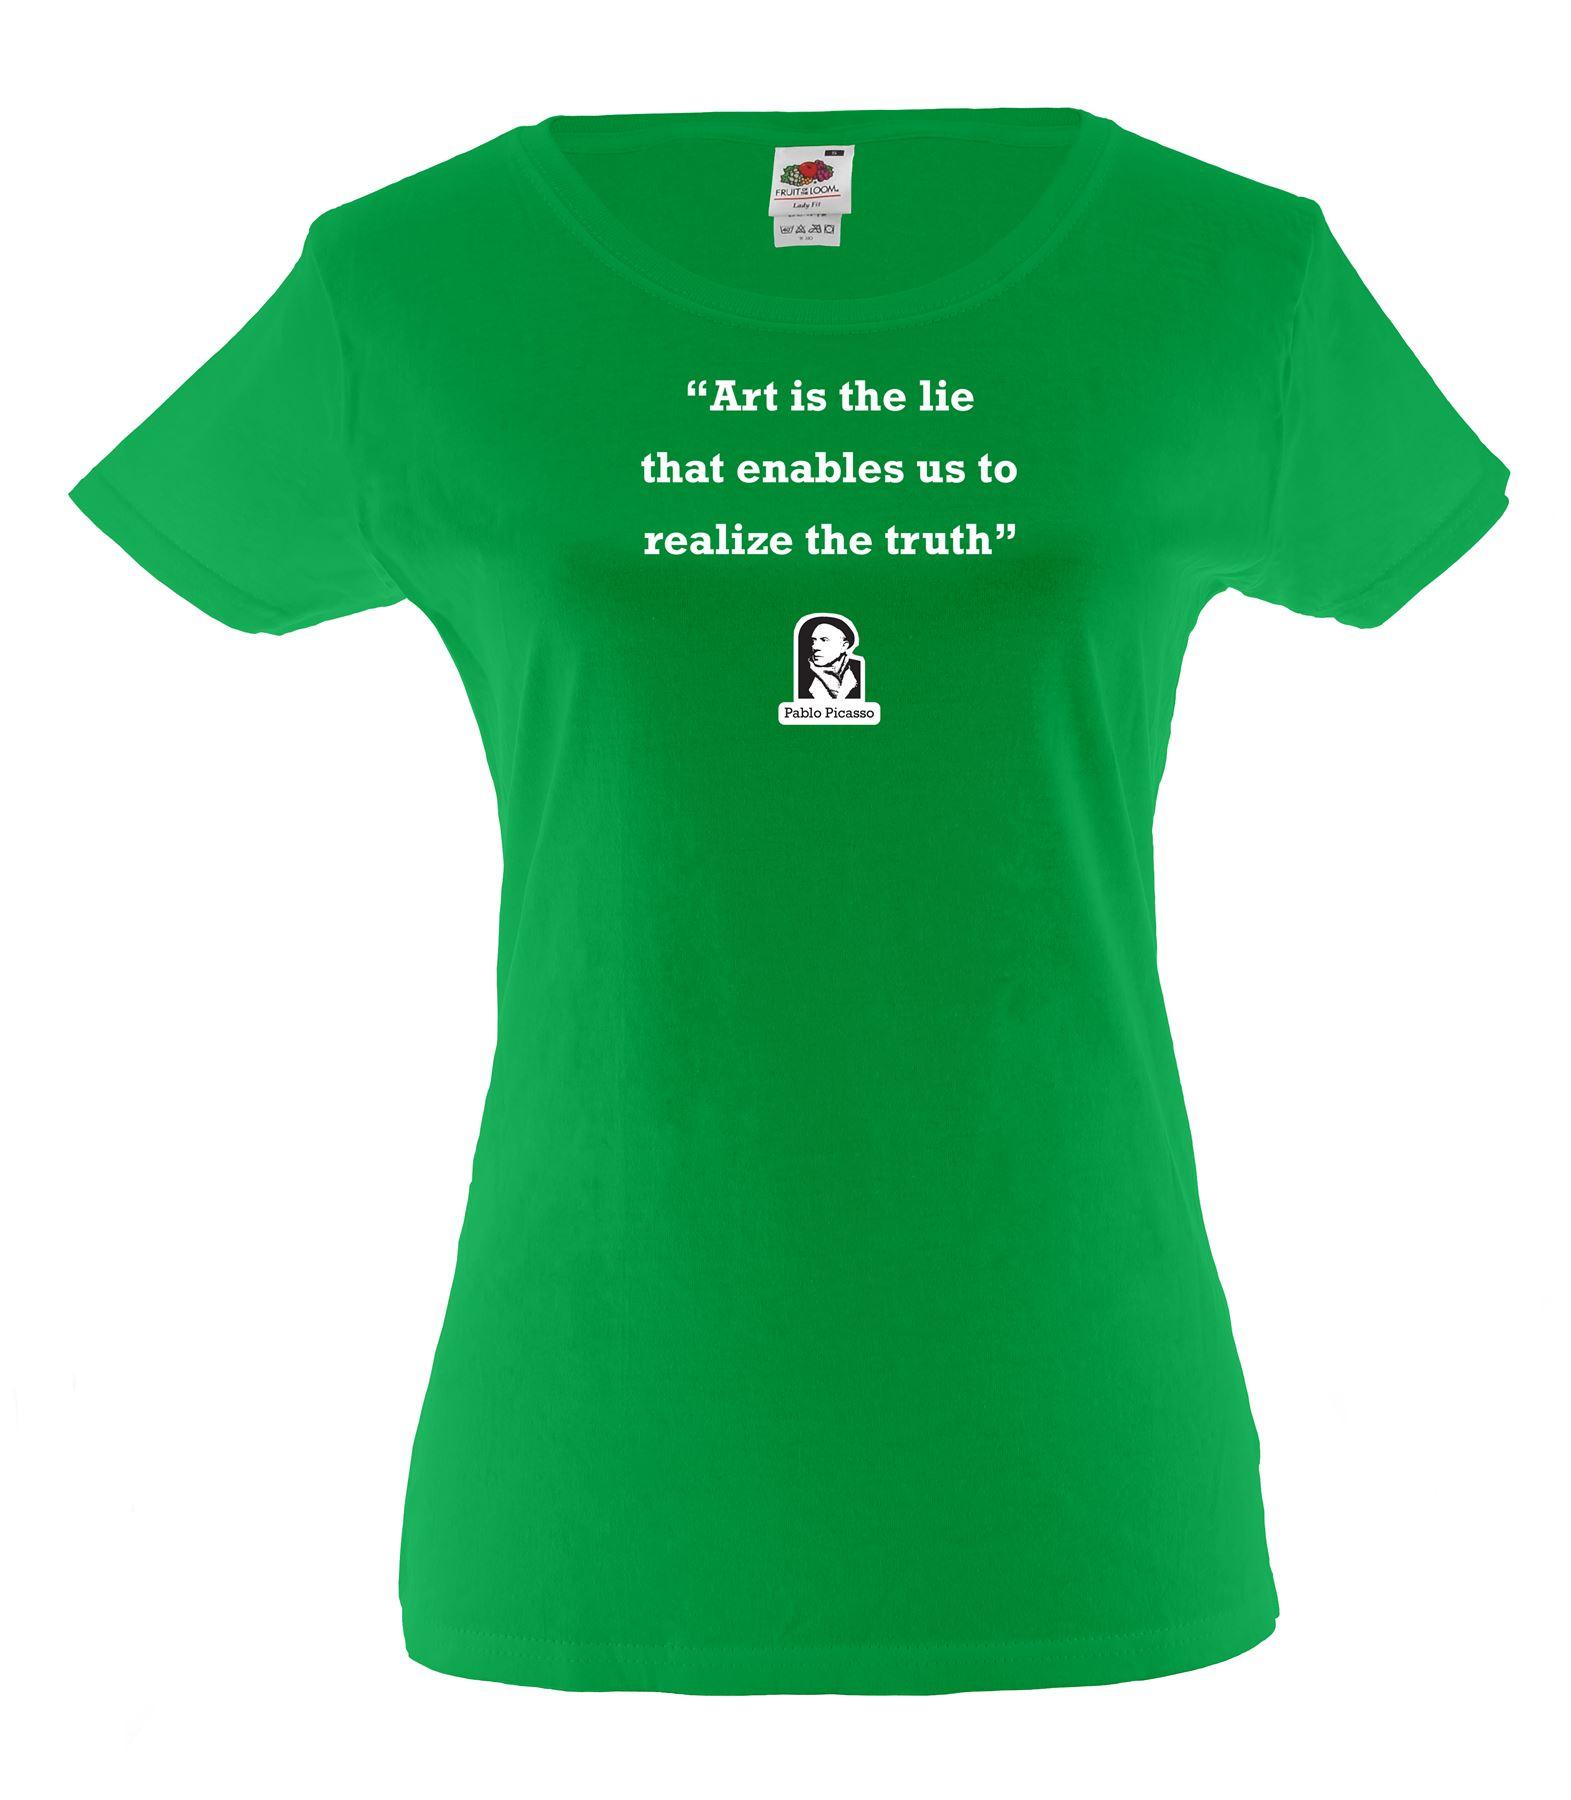 Shirt design ladies - Ladies Printed Cotton T Shirt New Tee Shirts